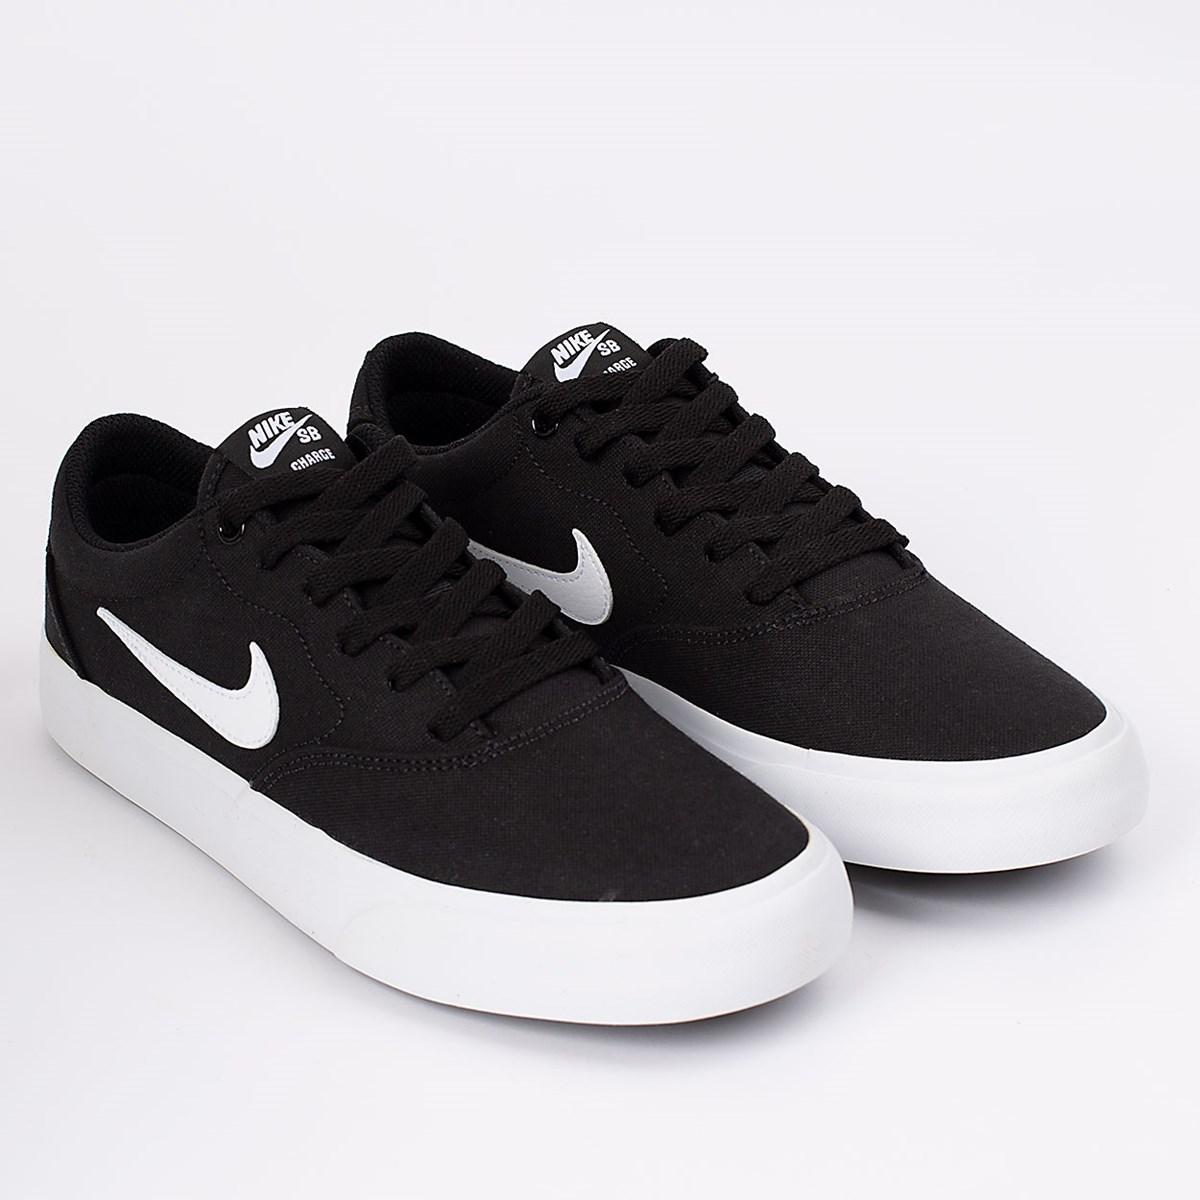 Tênis Nike SB Charge SLR Black White CD6279-002